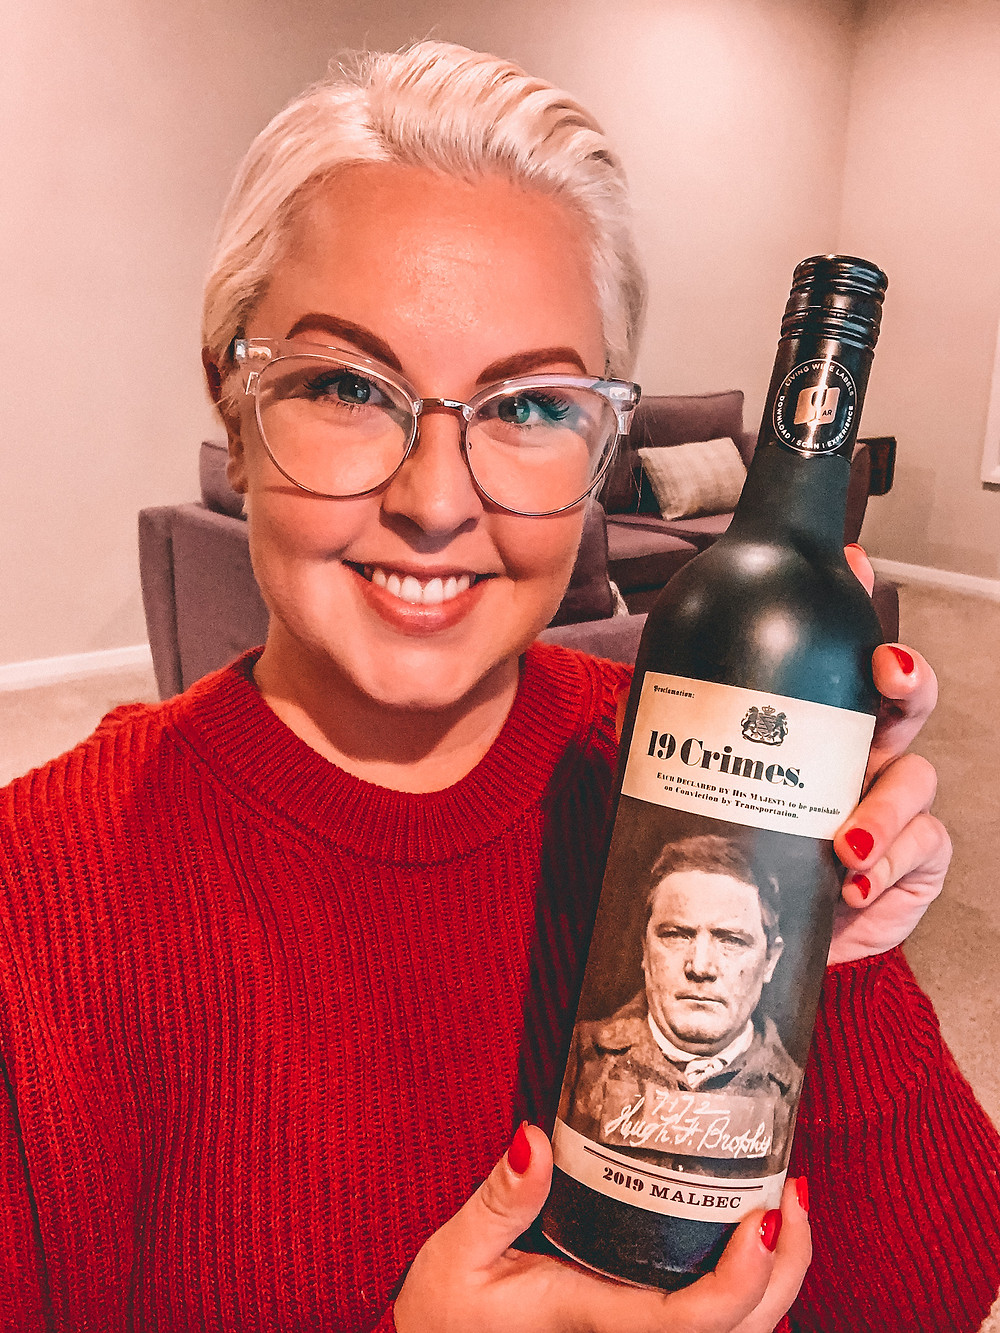 Wine influencer holding red wine bottle